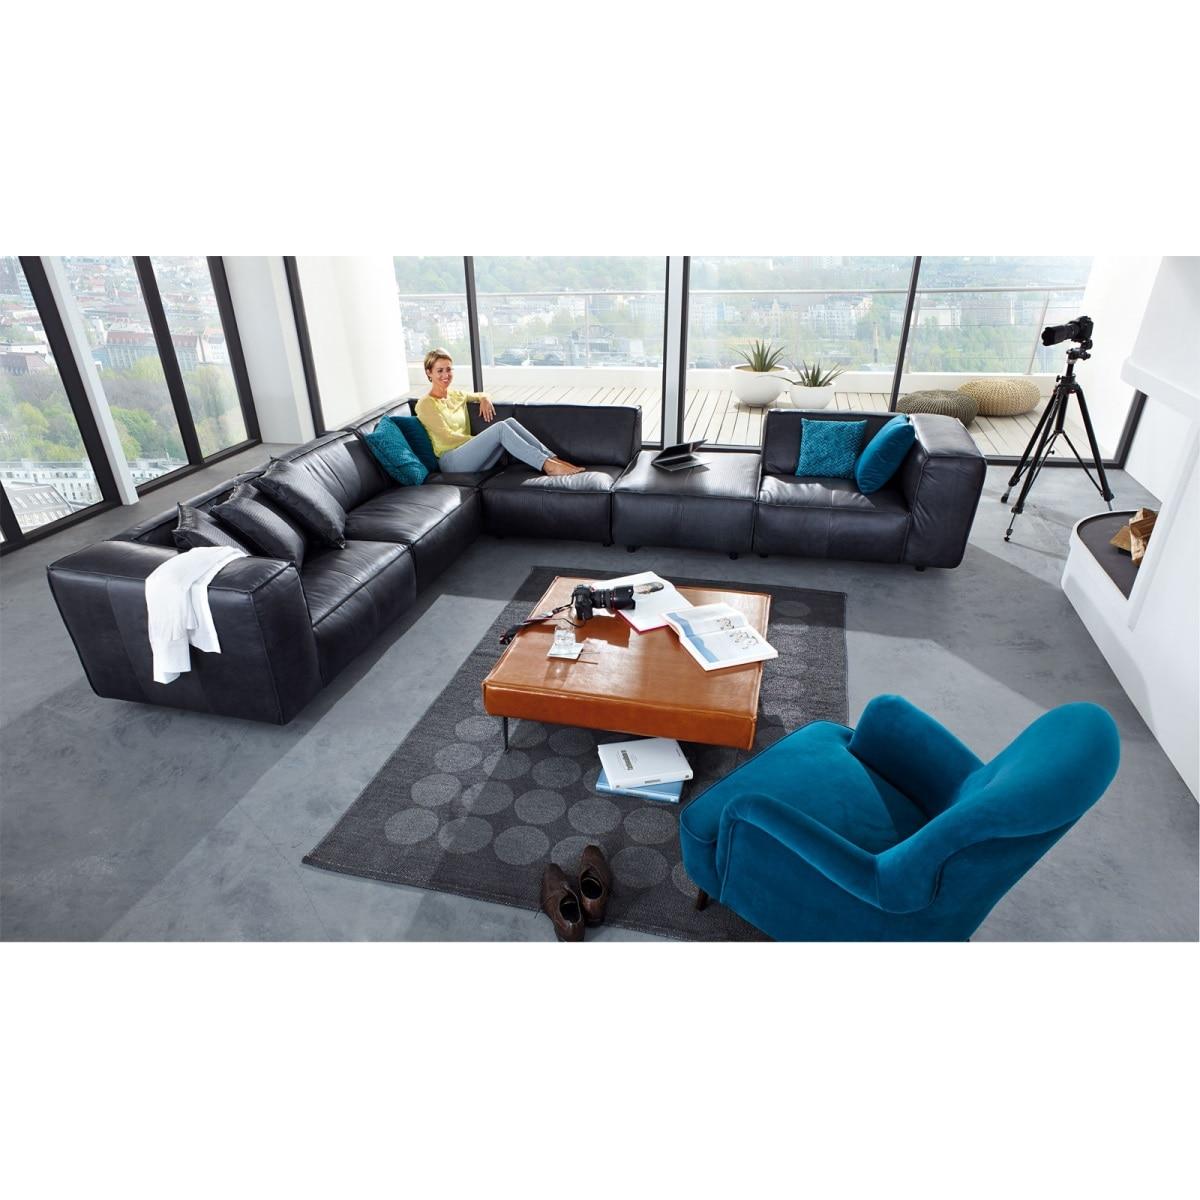 mondo polsterecke fauna lederbezug anthrazit ca 304 x 387 cm porta. Black Bedroom Furniture Sets. Home Design Ideas